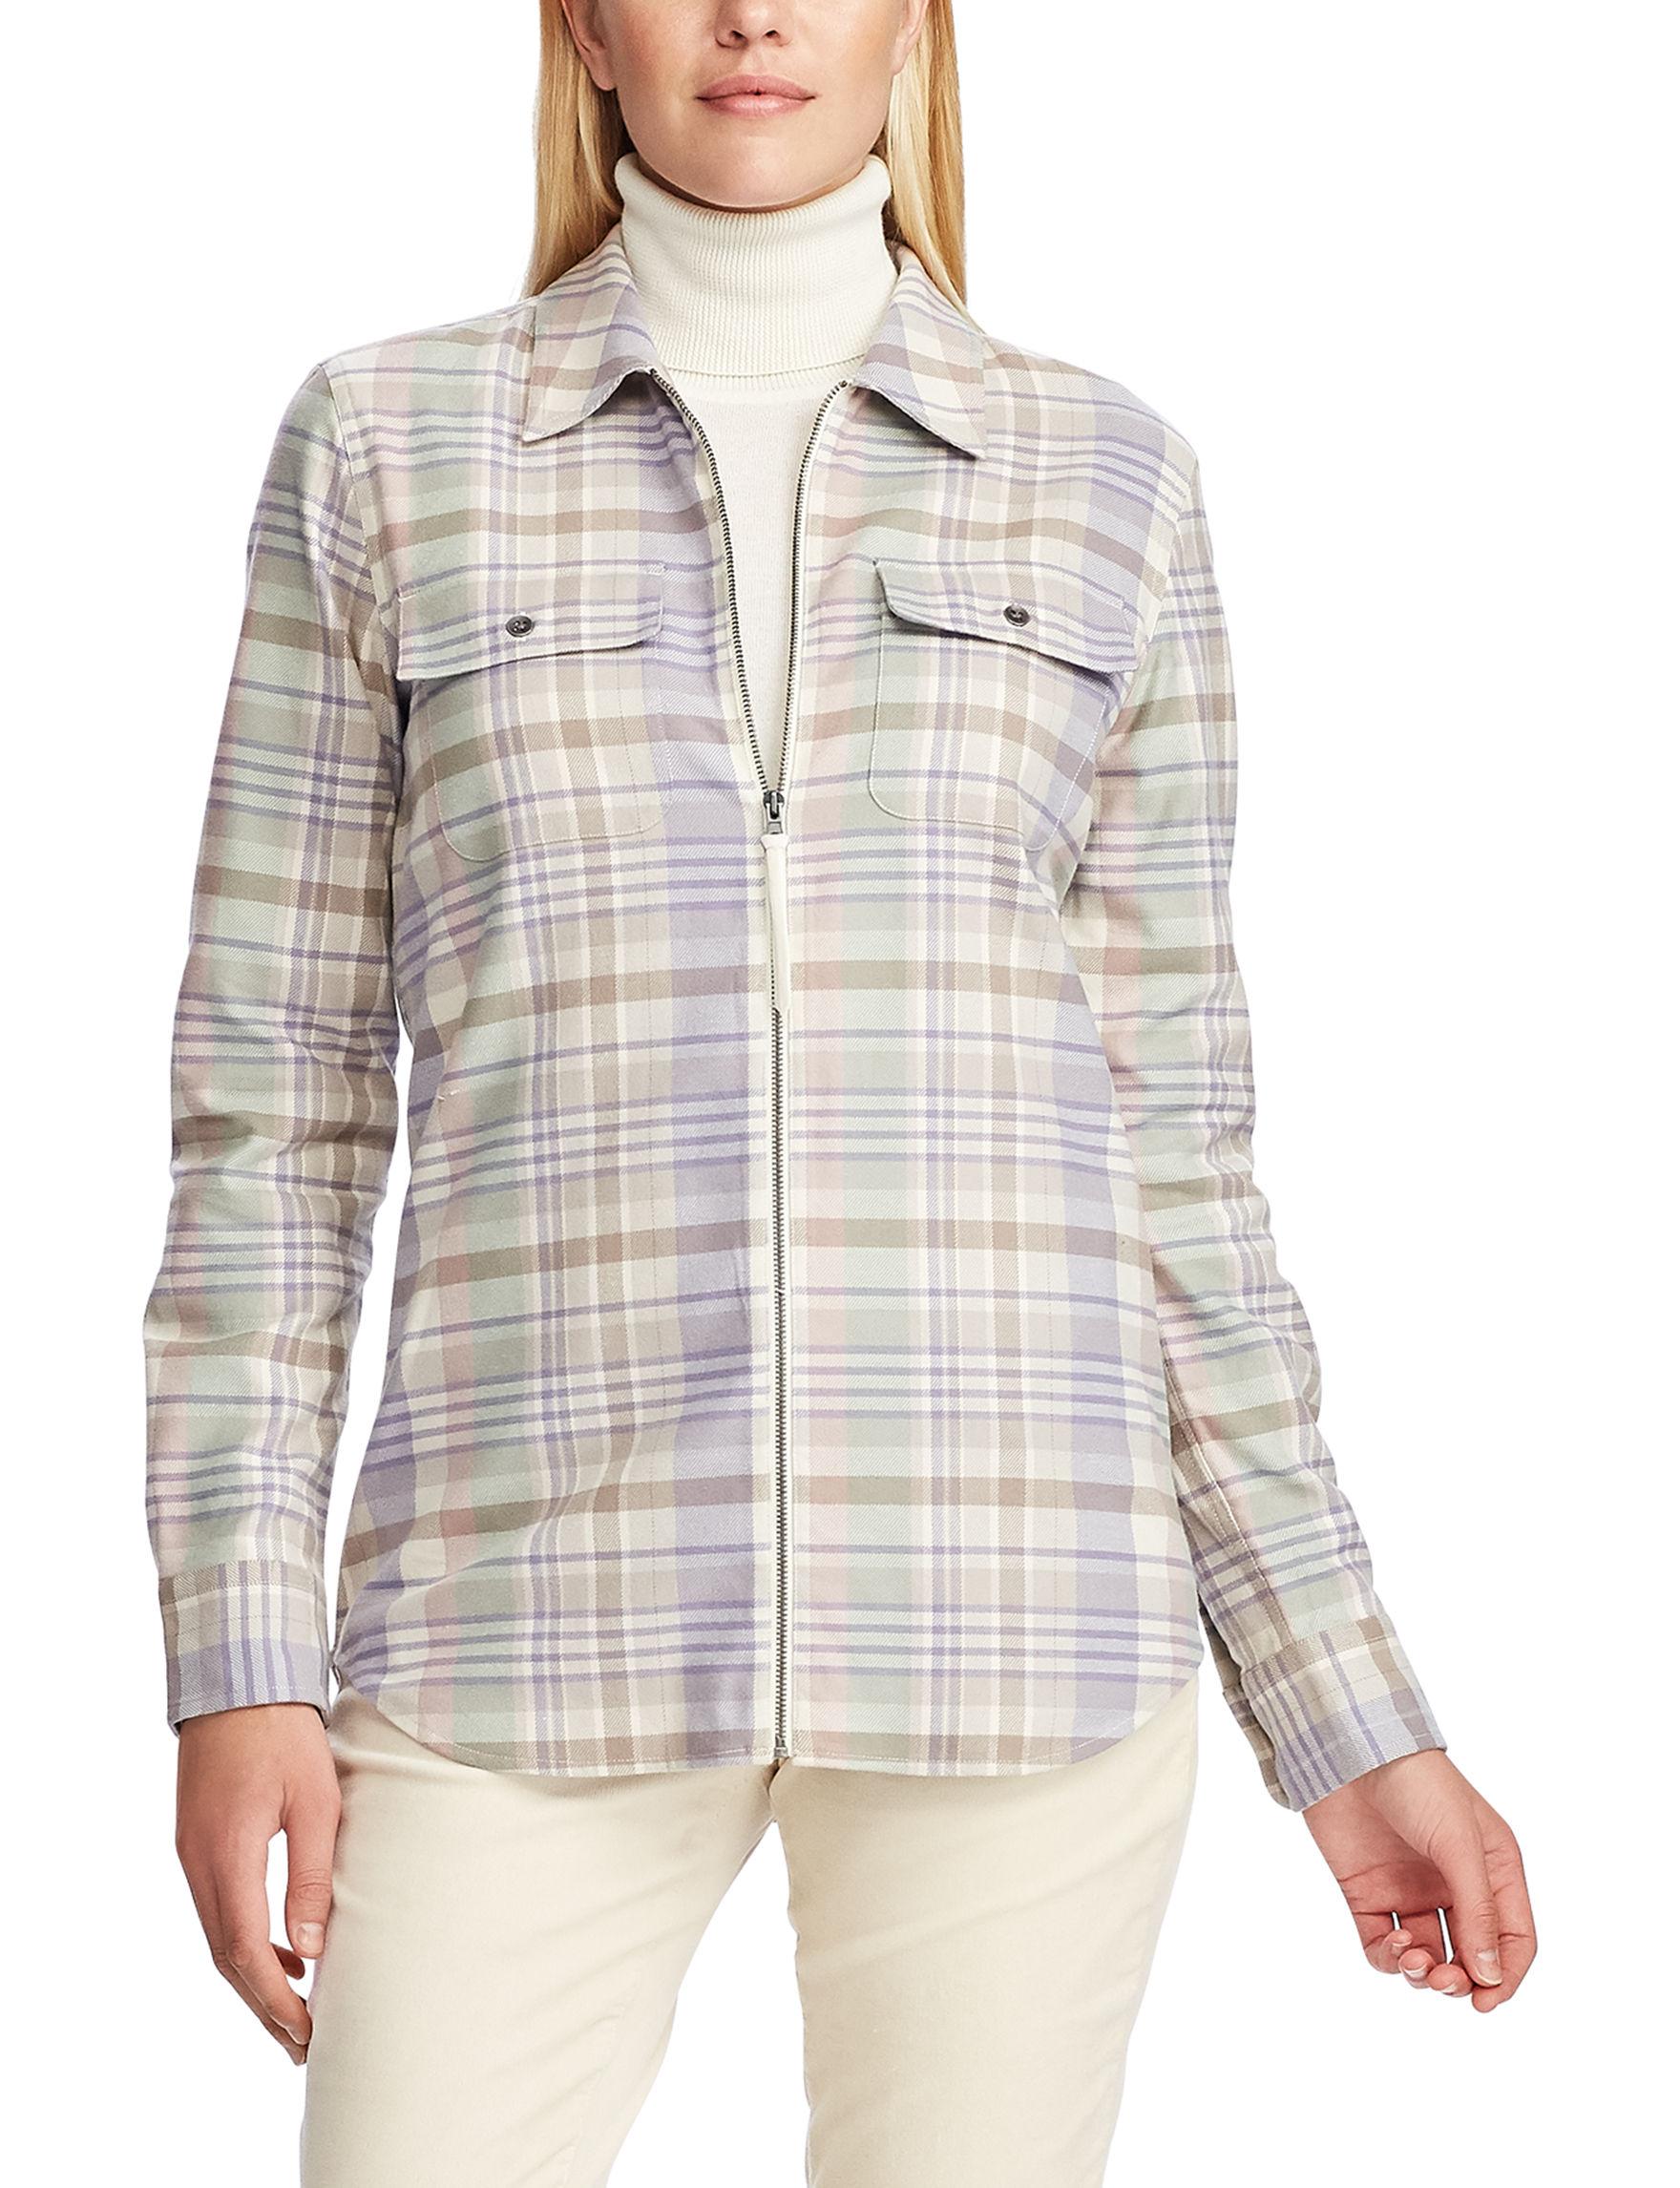 Chaps Cream Multi Shirts & Blouses